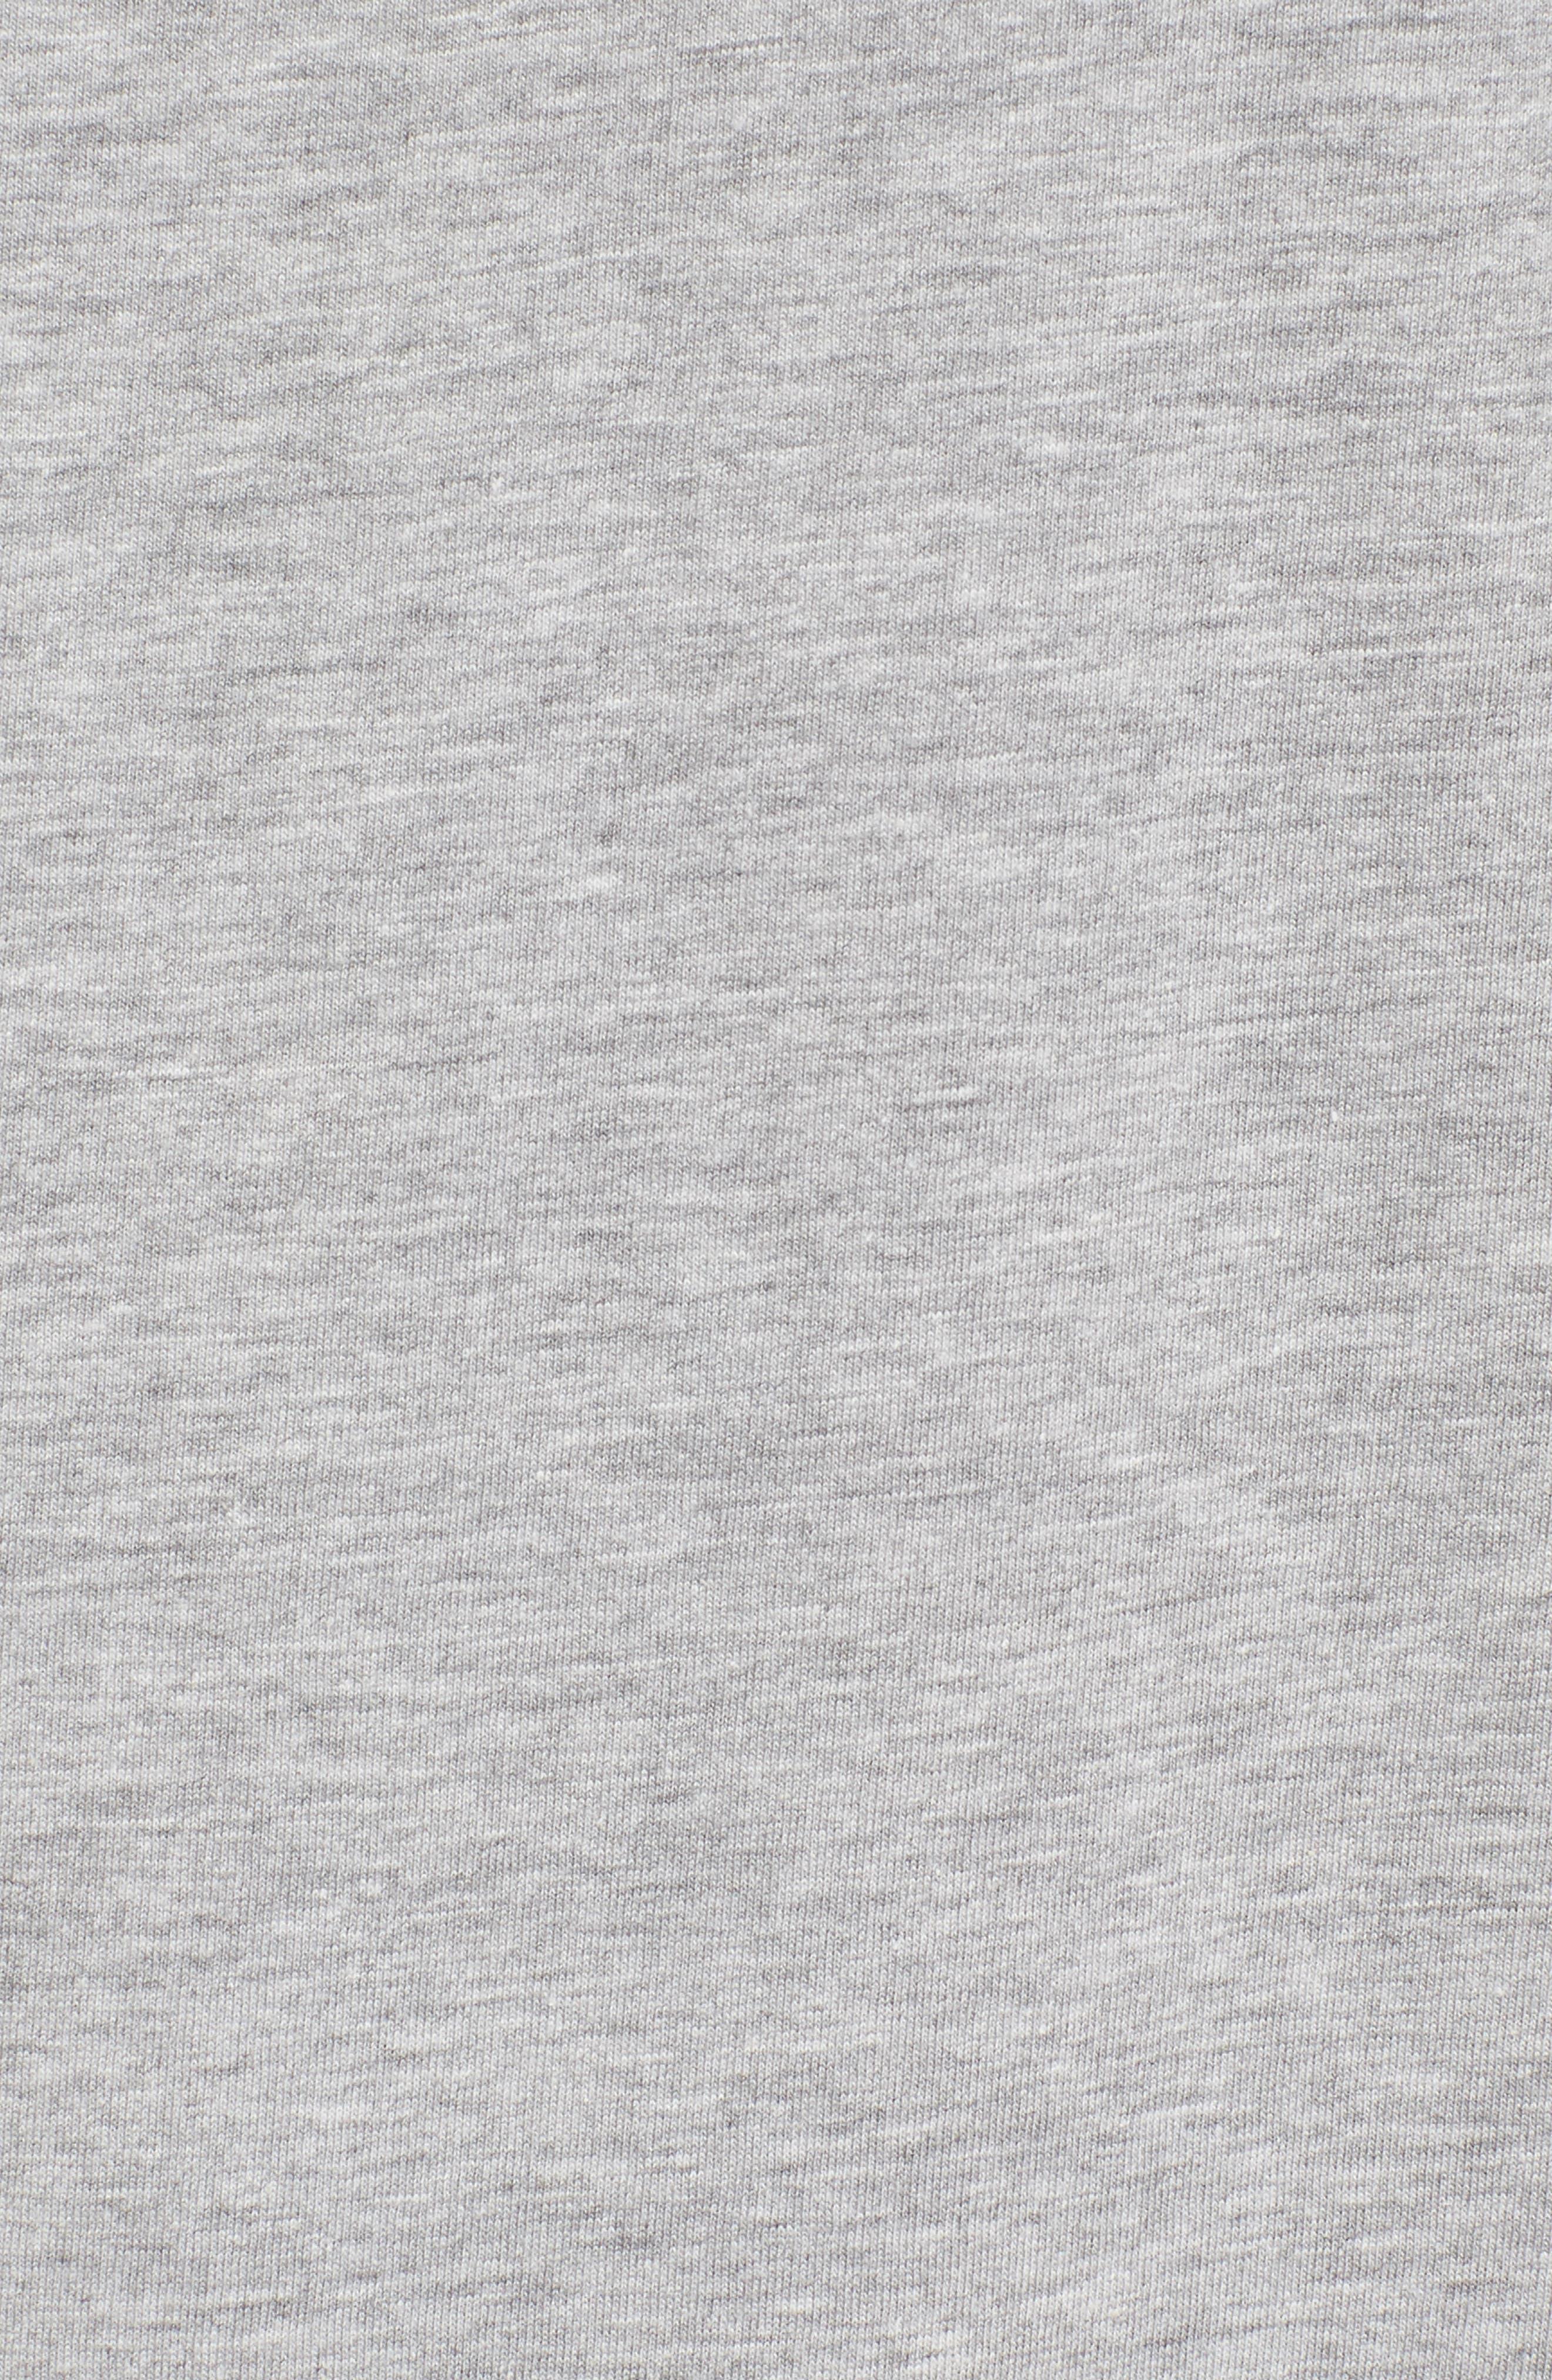 Raglan Short Sleeve T-Shirt,                             Alternate thumbnail 5, color,                             052